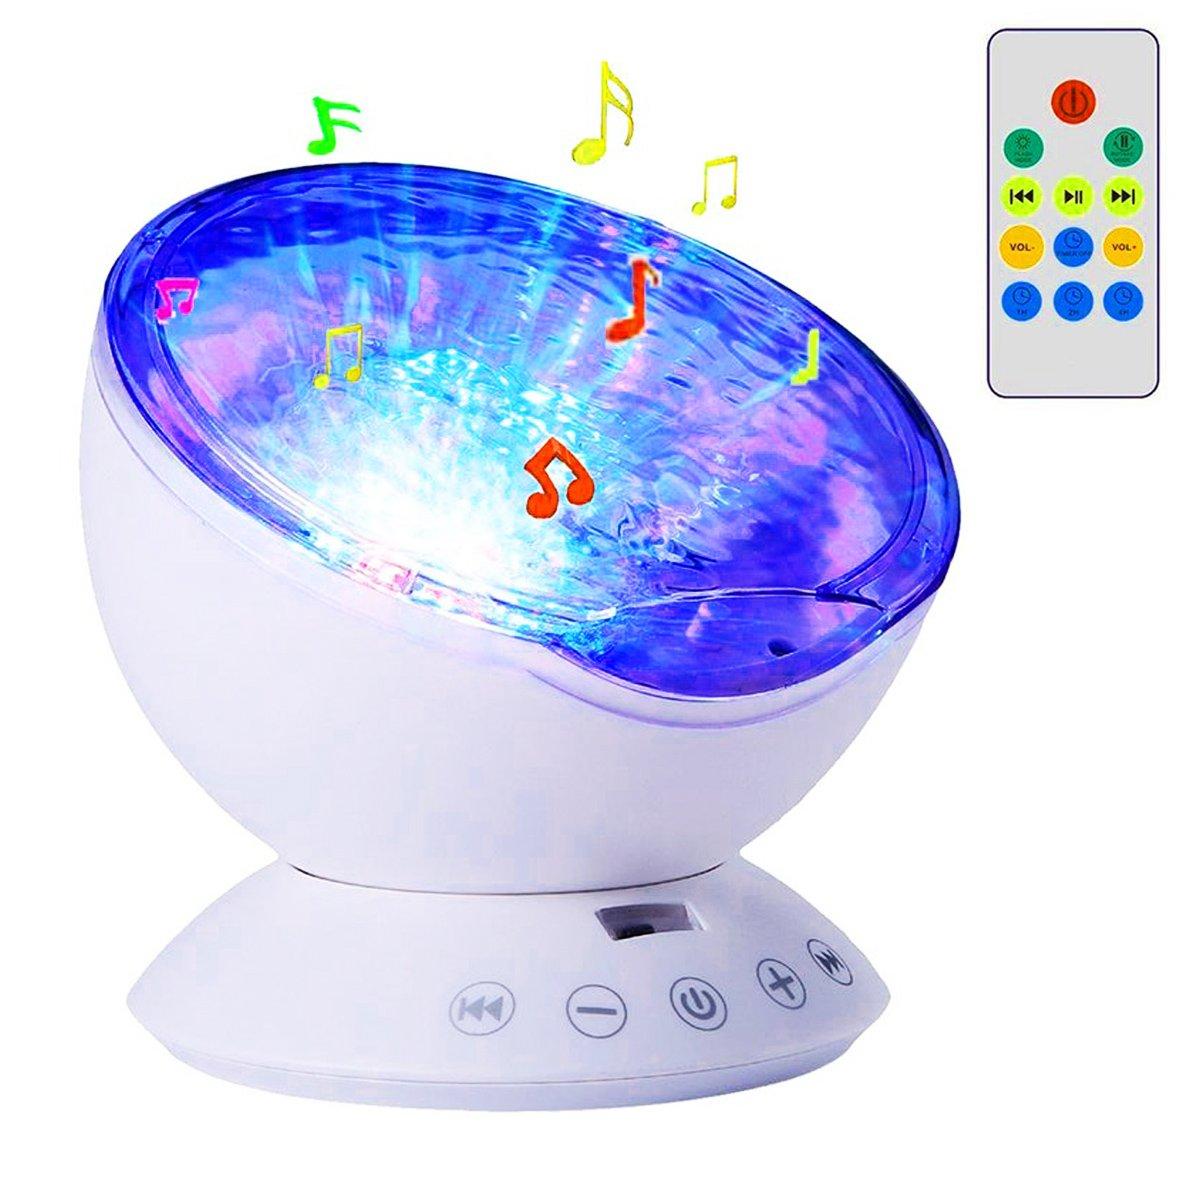 Go hand Ocean WaveプロジェクタナイトライトAuroraランプ内蔵音楽プレーヤーとリモートコントロール7カラフルなライトモードキッズ大人旅行ホーム寝室リビングルーム装飾用(ホワイト) B07D33242V 28548